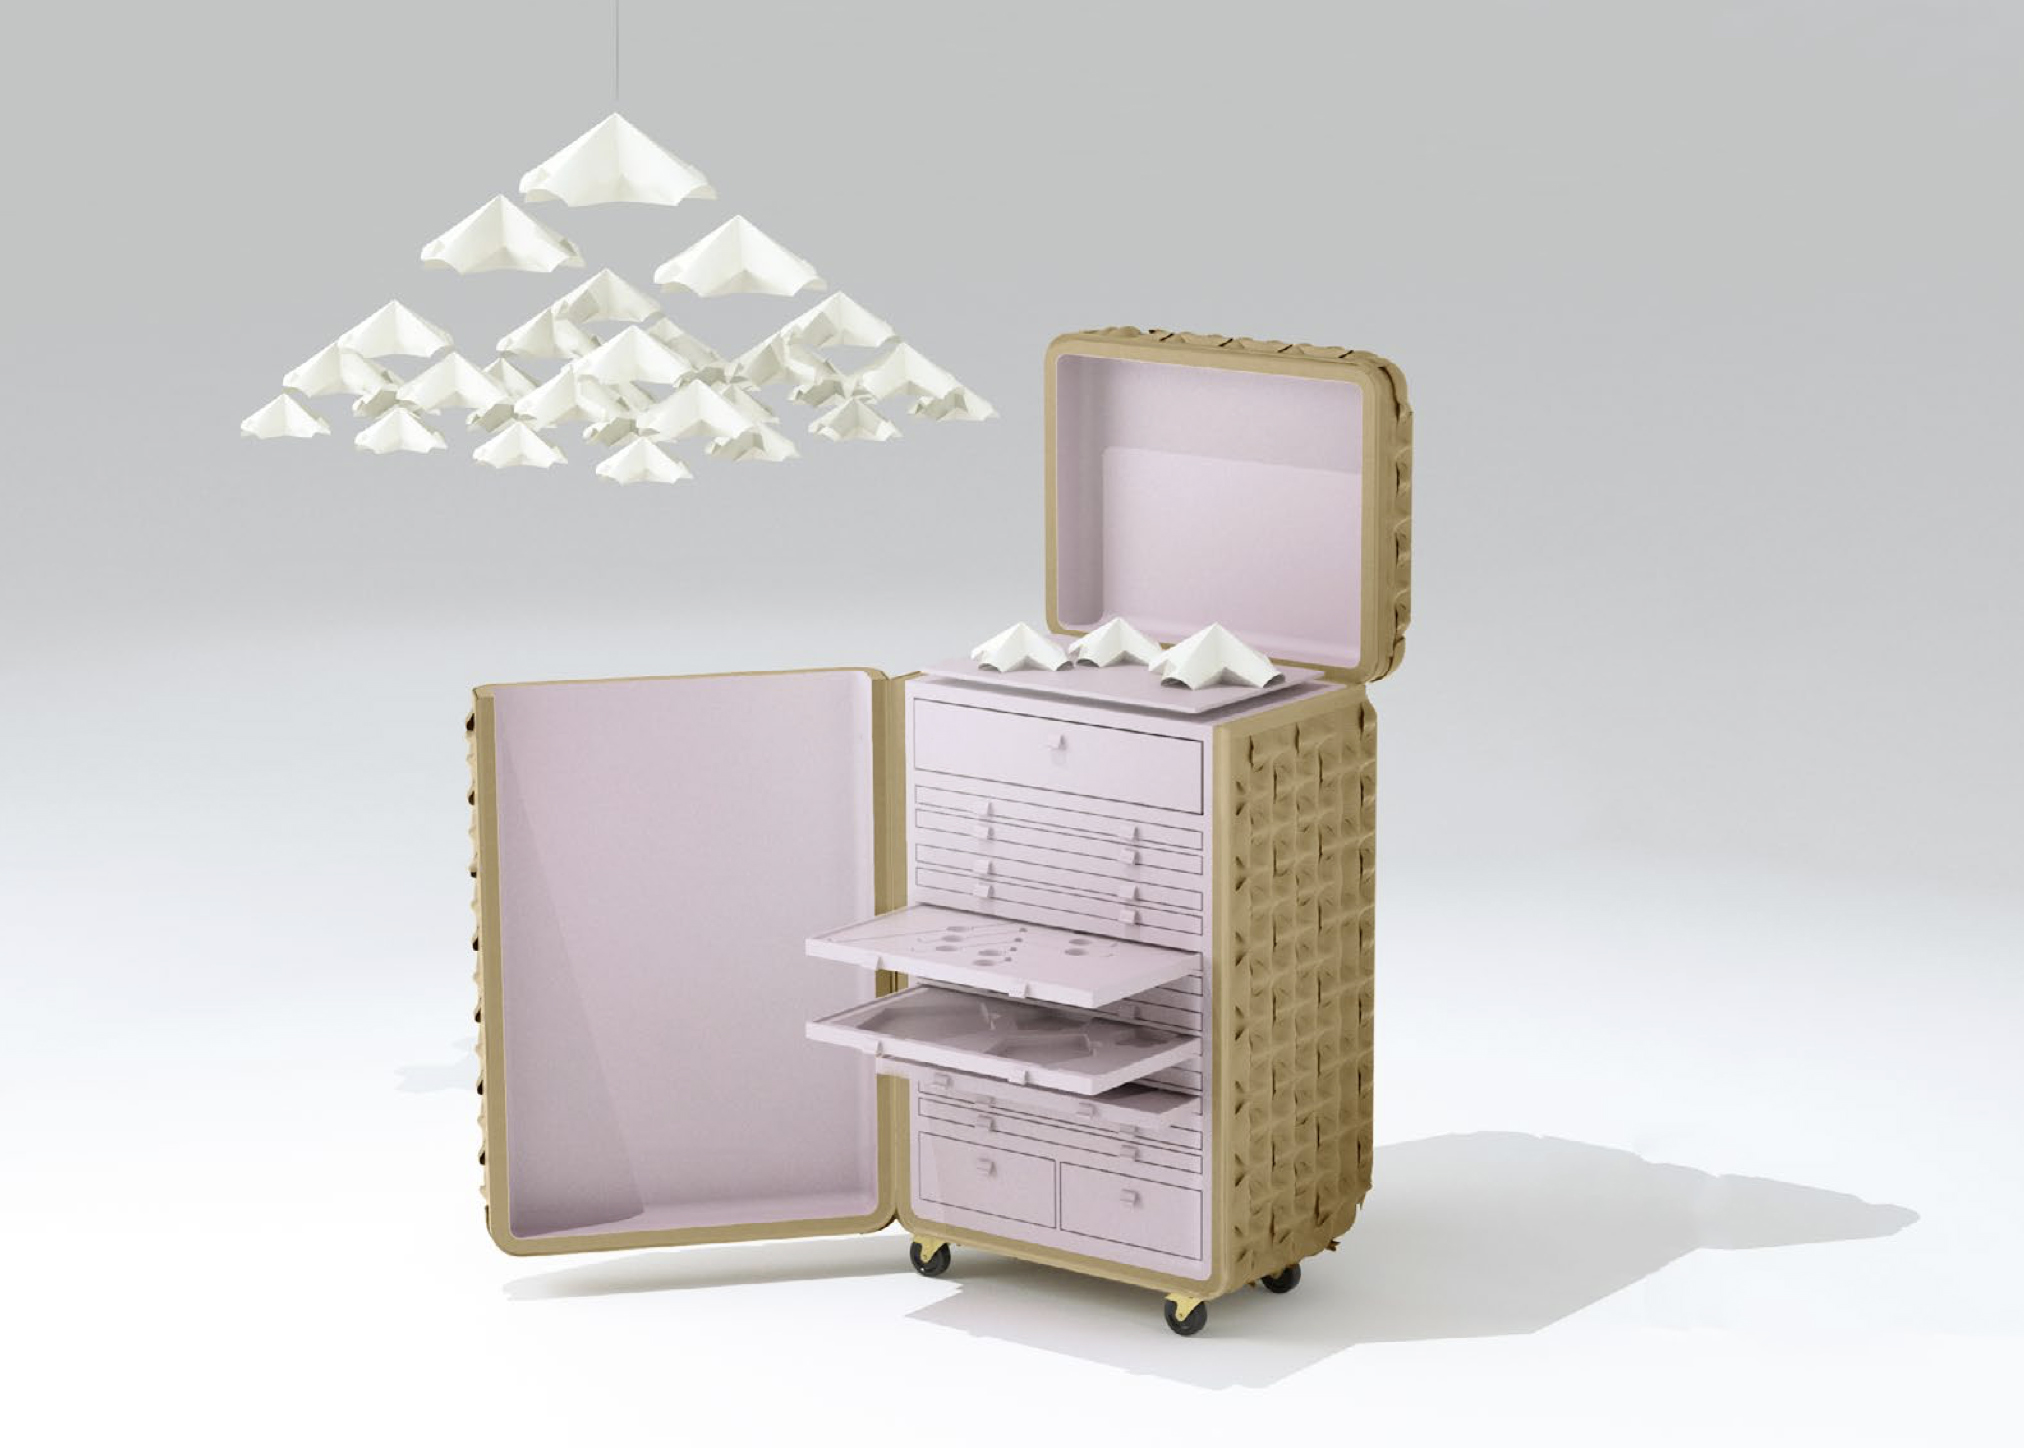 atelier oï x L'Atelier Casablanca  Parfum trunk and Honminoshi Garden  2016  Image courtesy of atelier oï